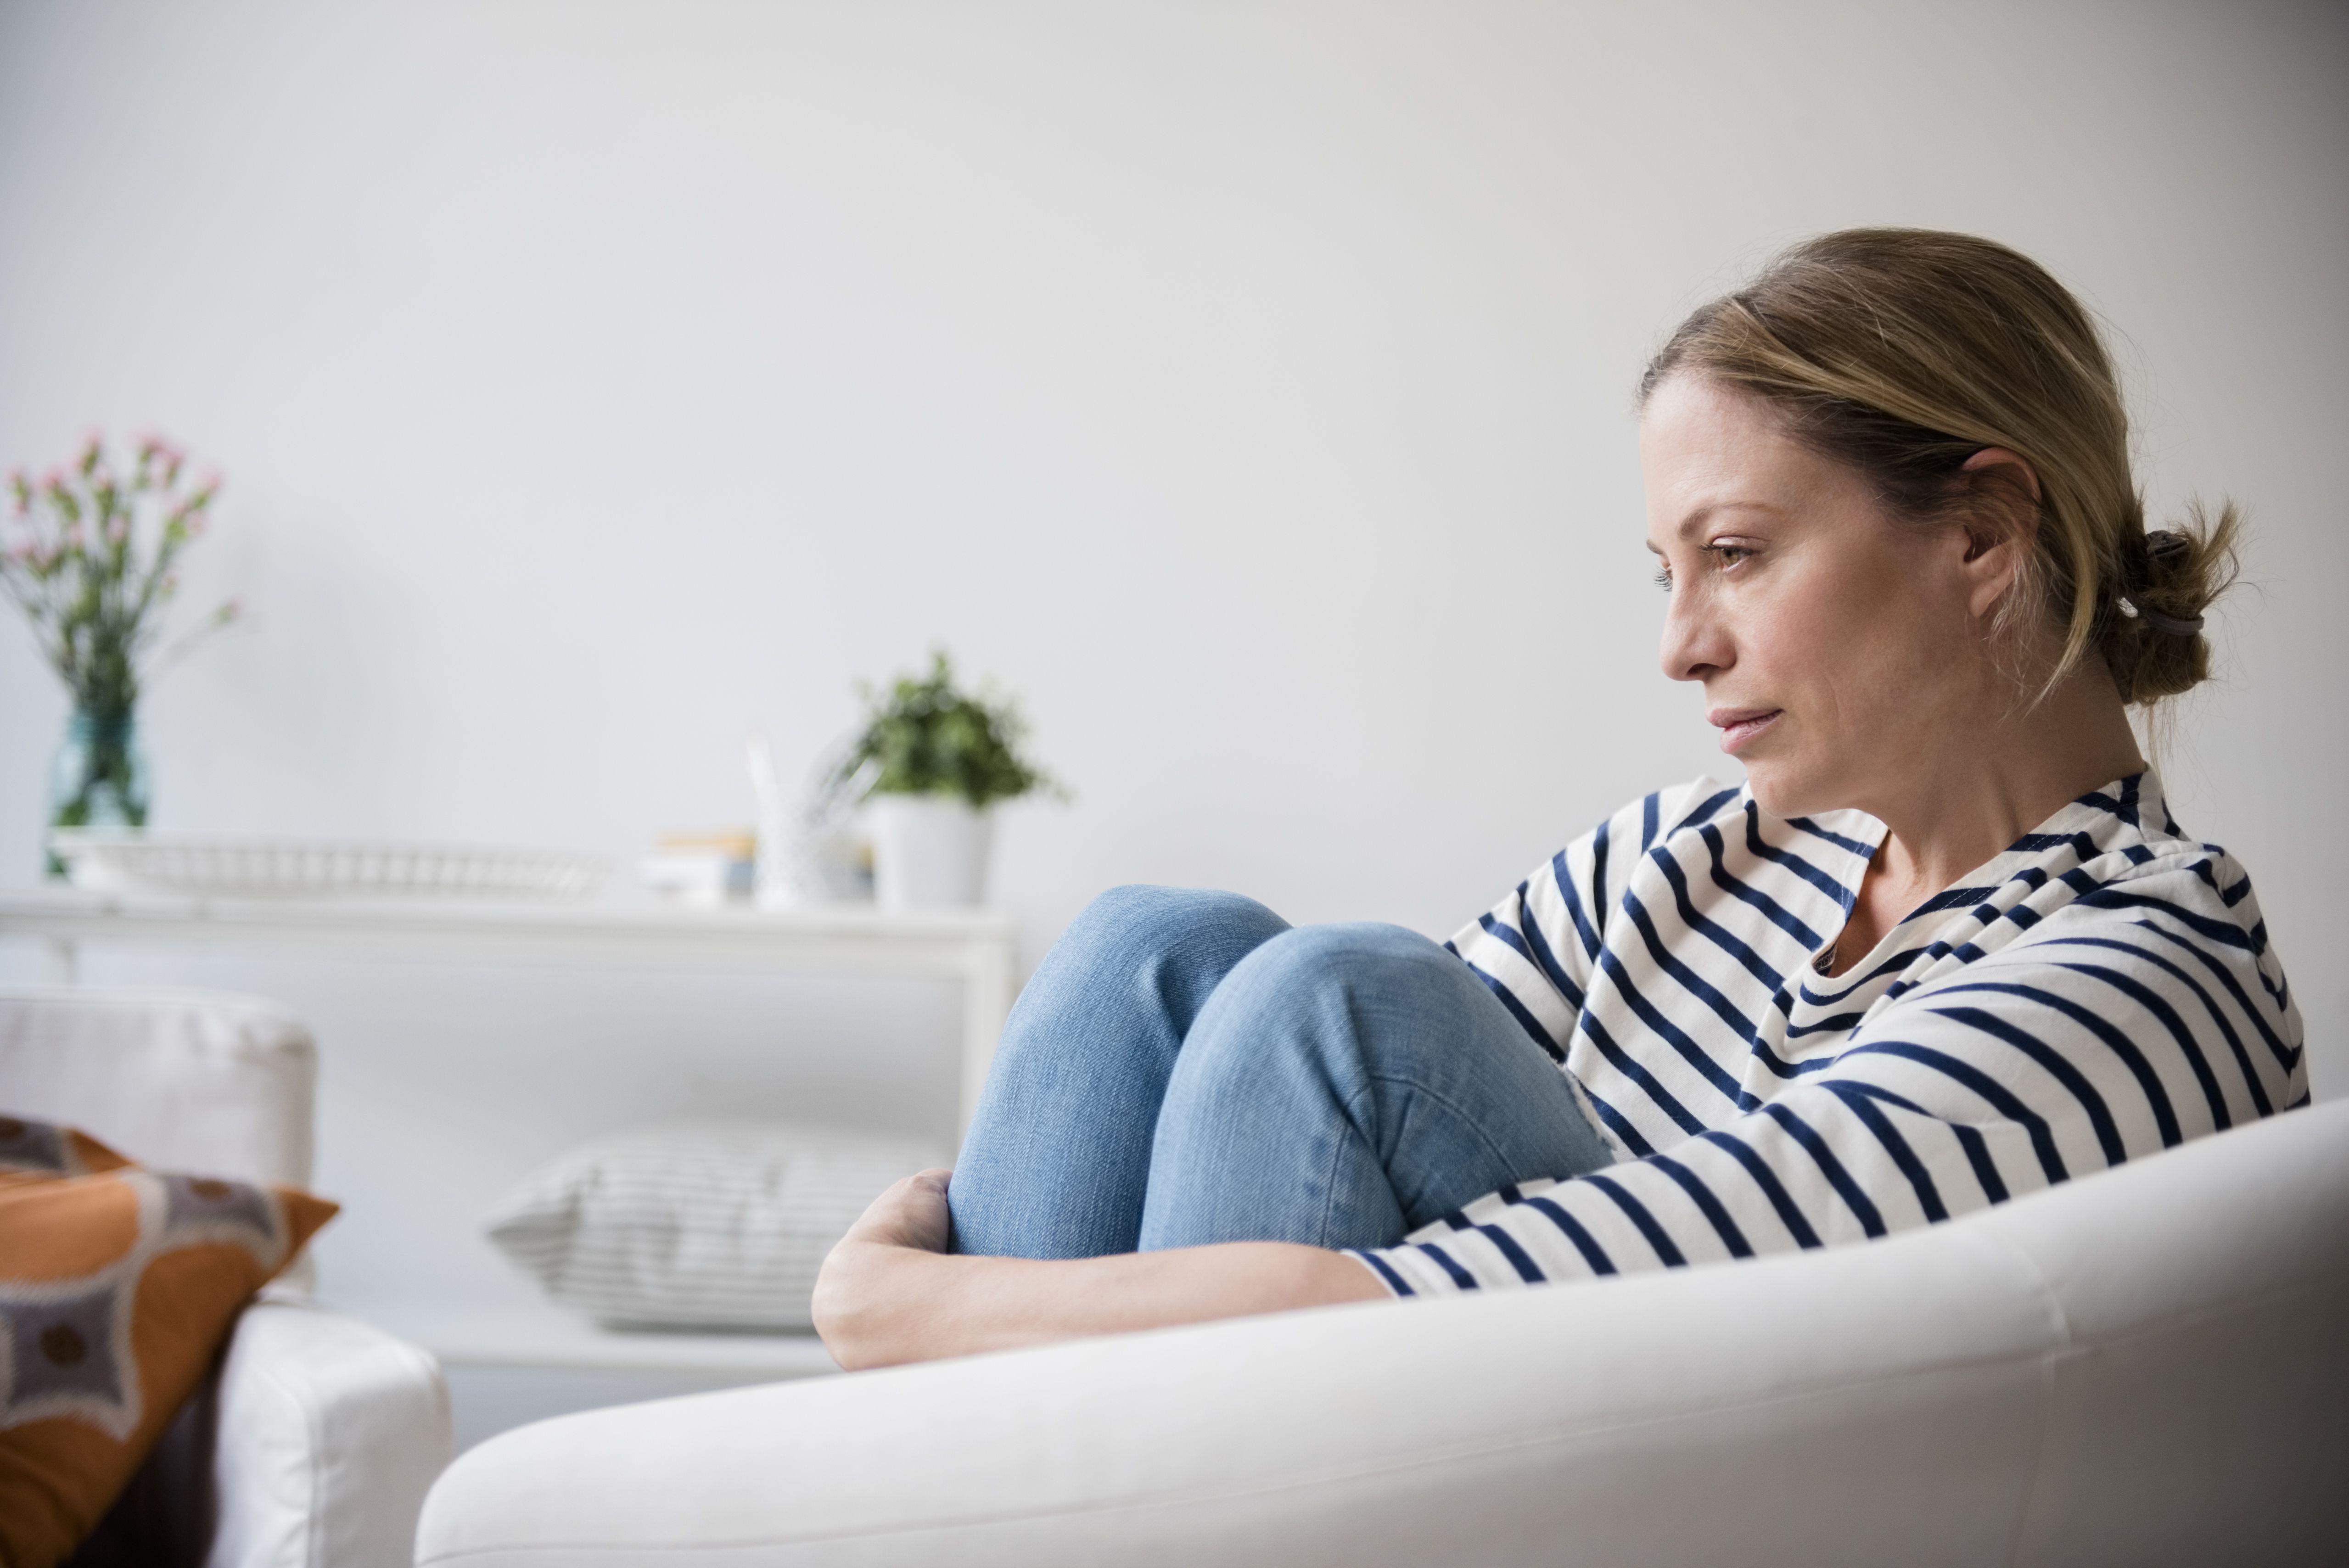 Caucasian woman sitting in armchair holding legs